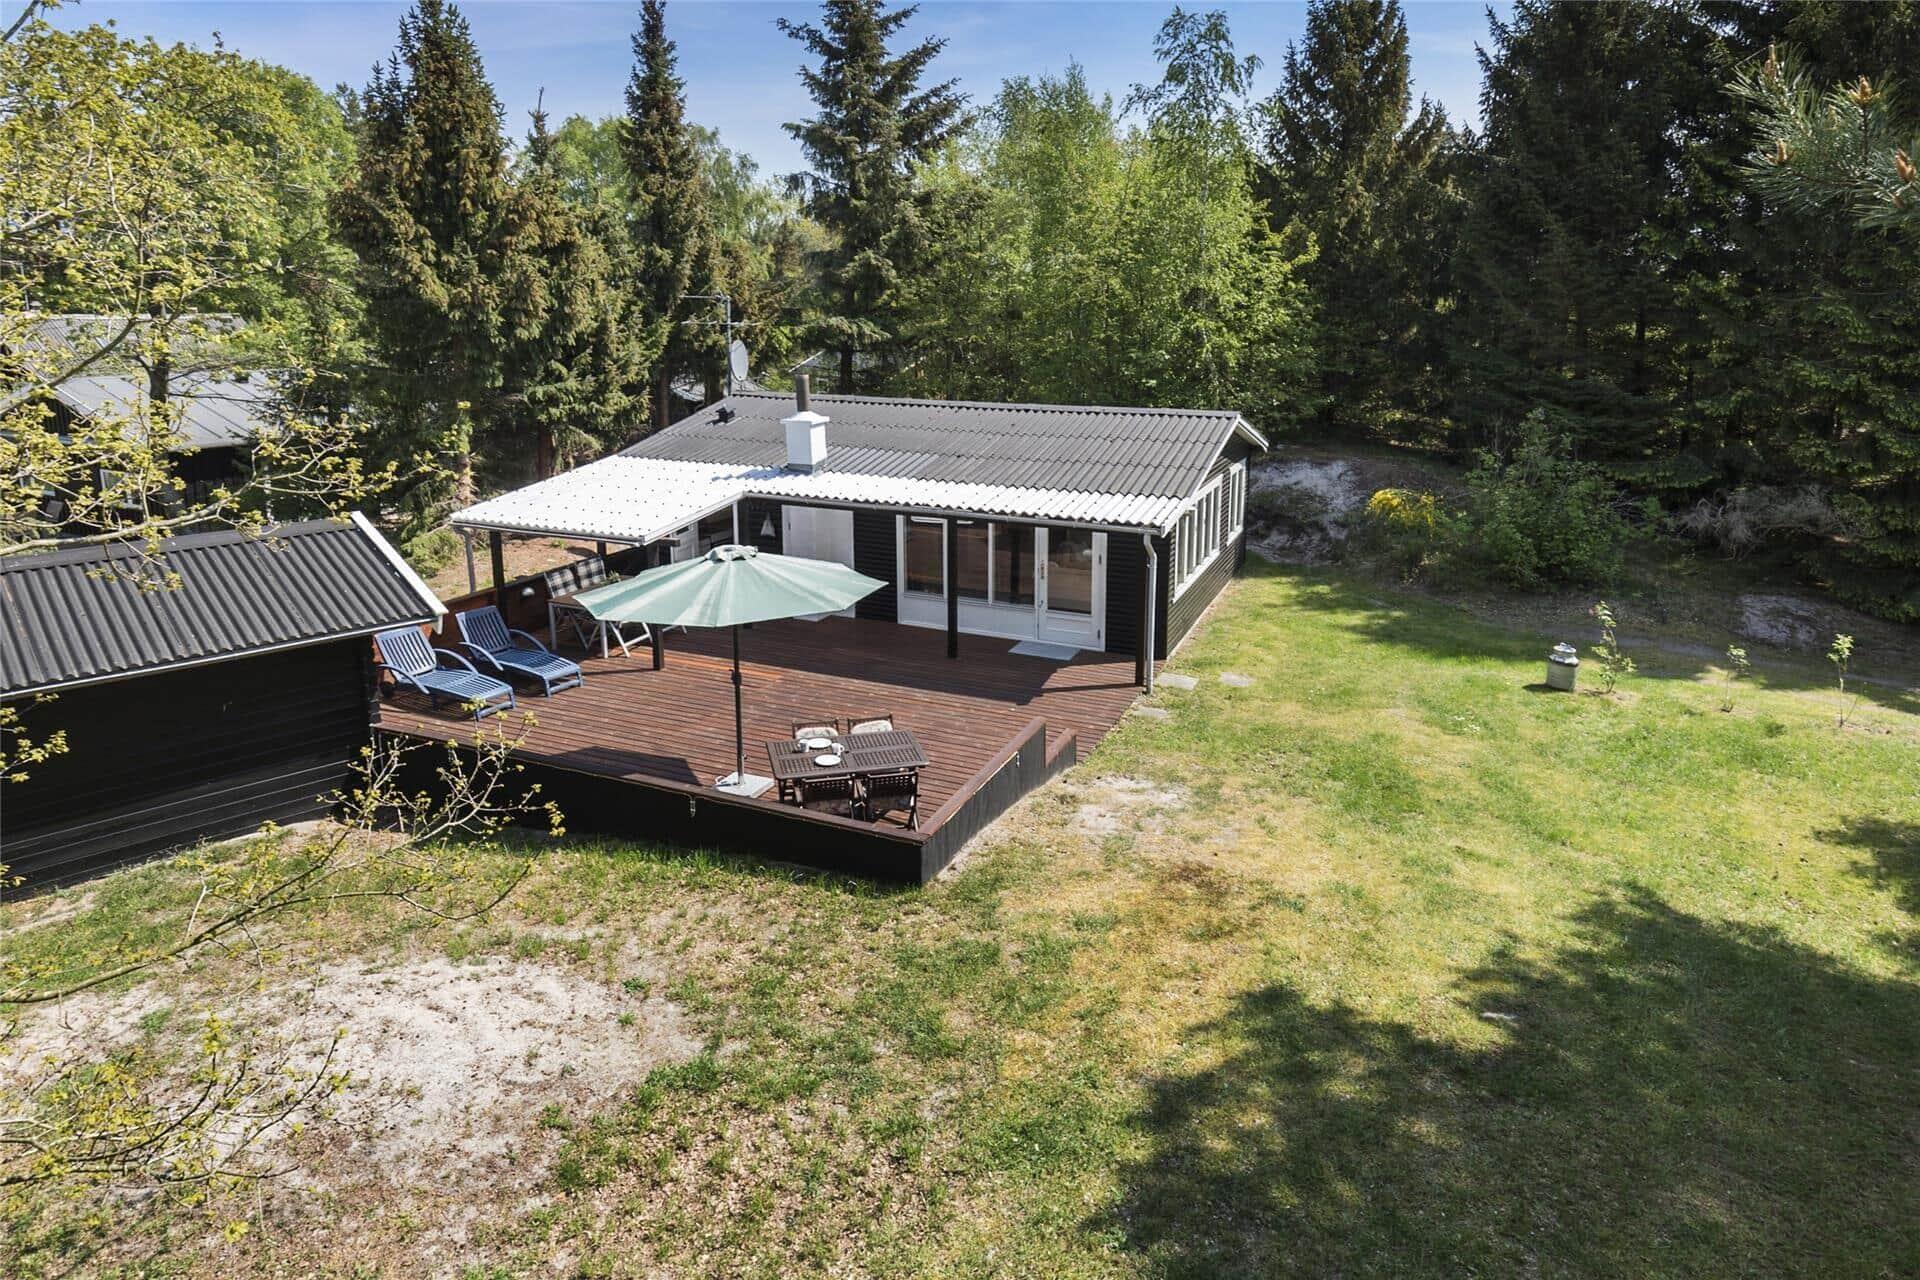 Billede 1-10 Sommerhus 1555, Ædjavejen 14, DK - 3720 Aakirkeby